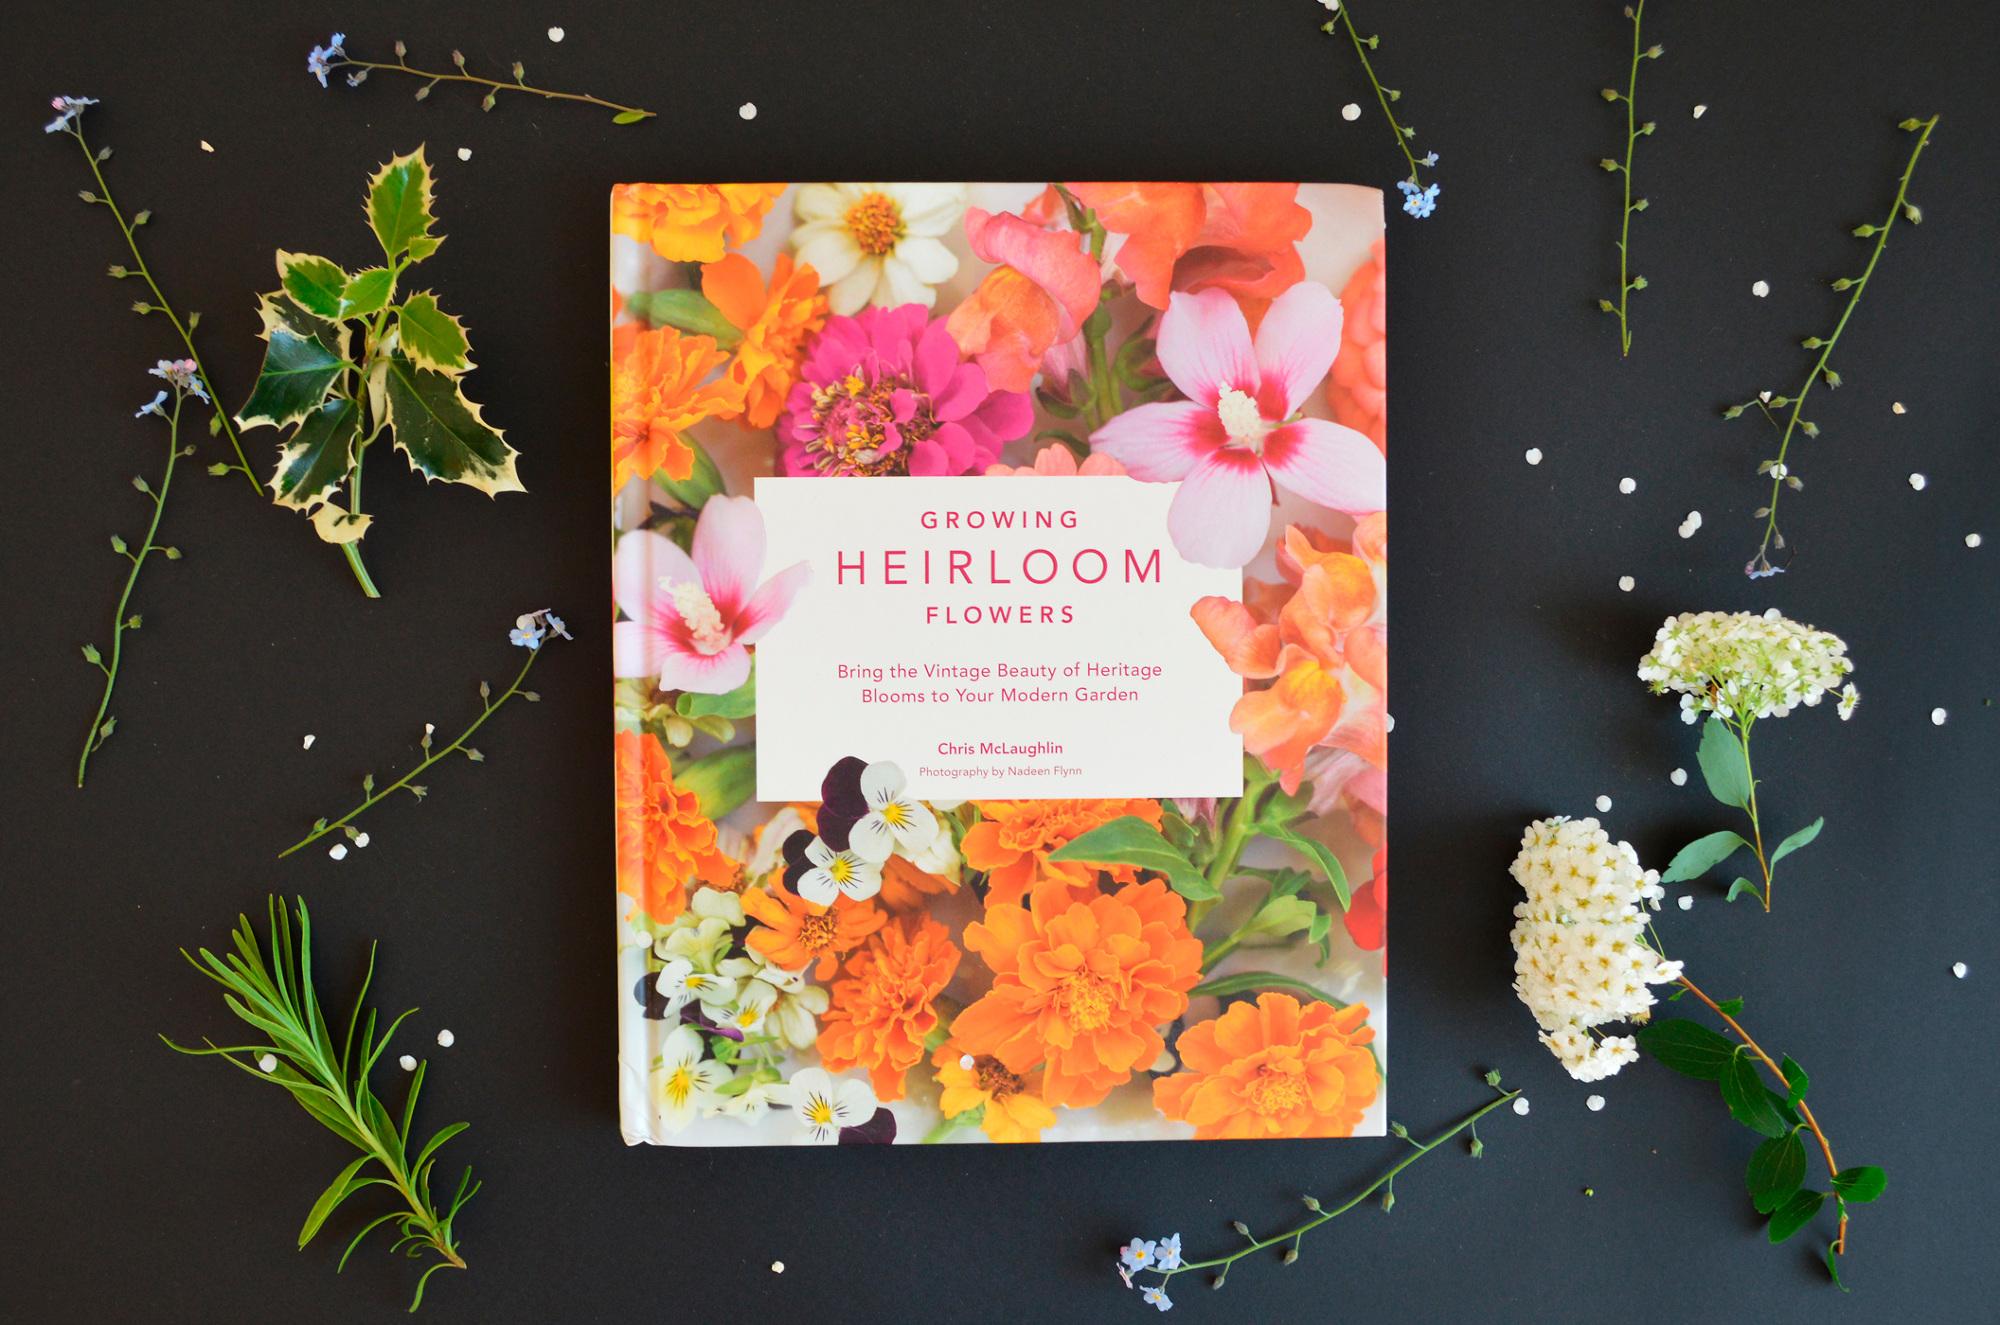 Growing Heirloom Flowers Evelin Kasikov Art Direction Graphic